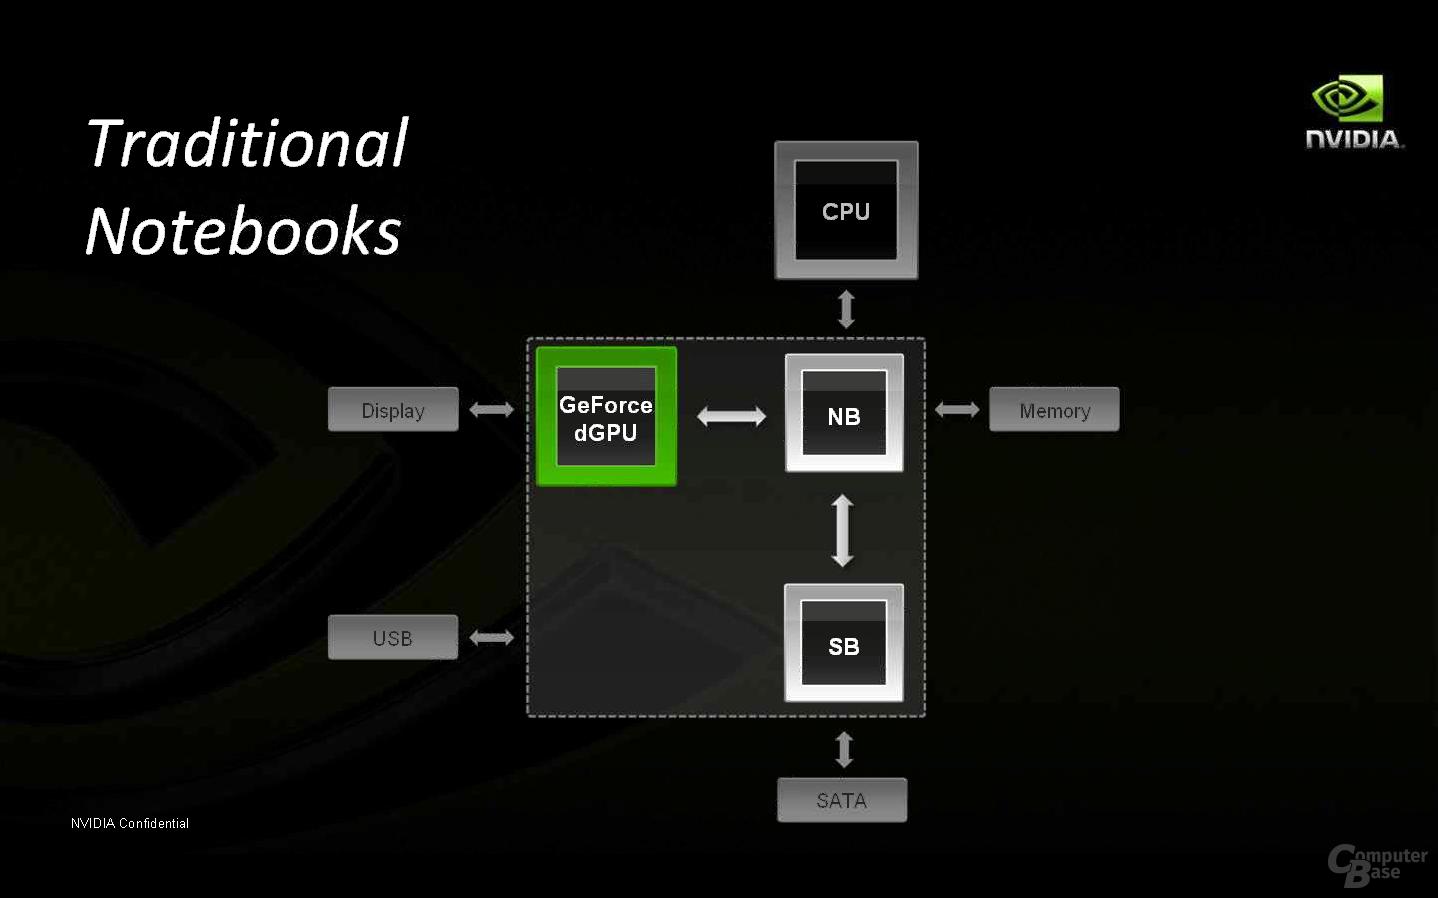 Nvidia GeForce 9400M